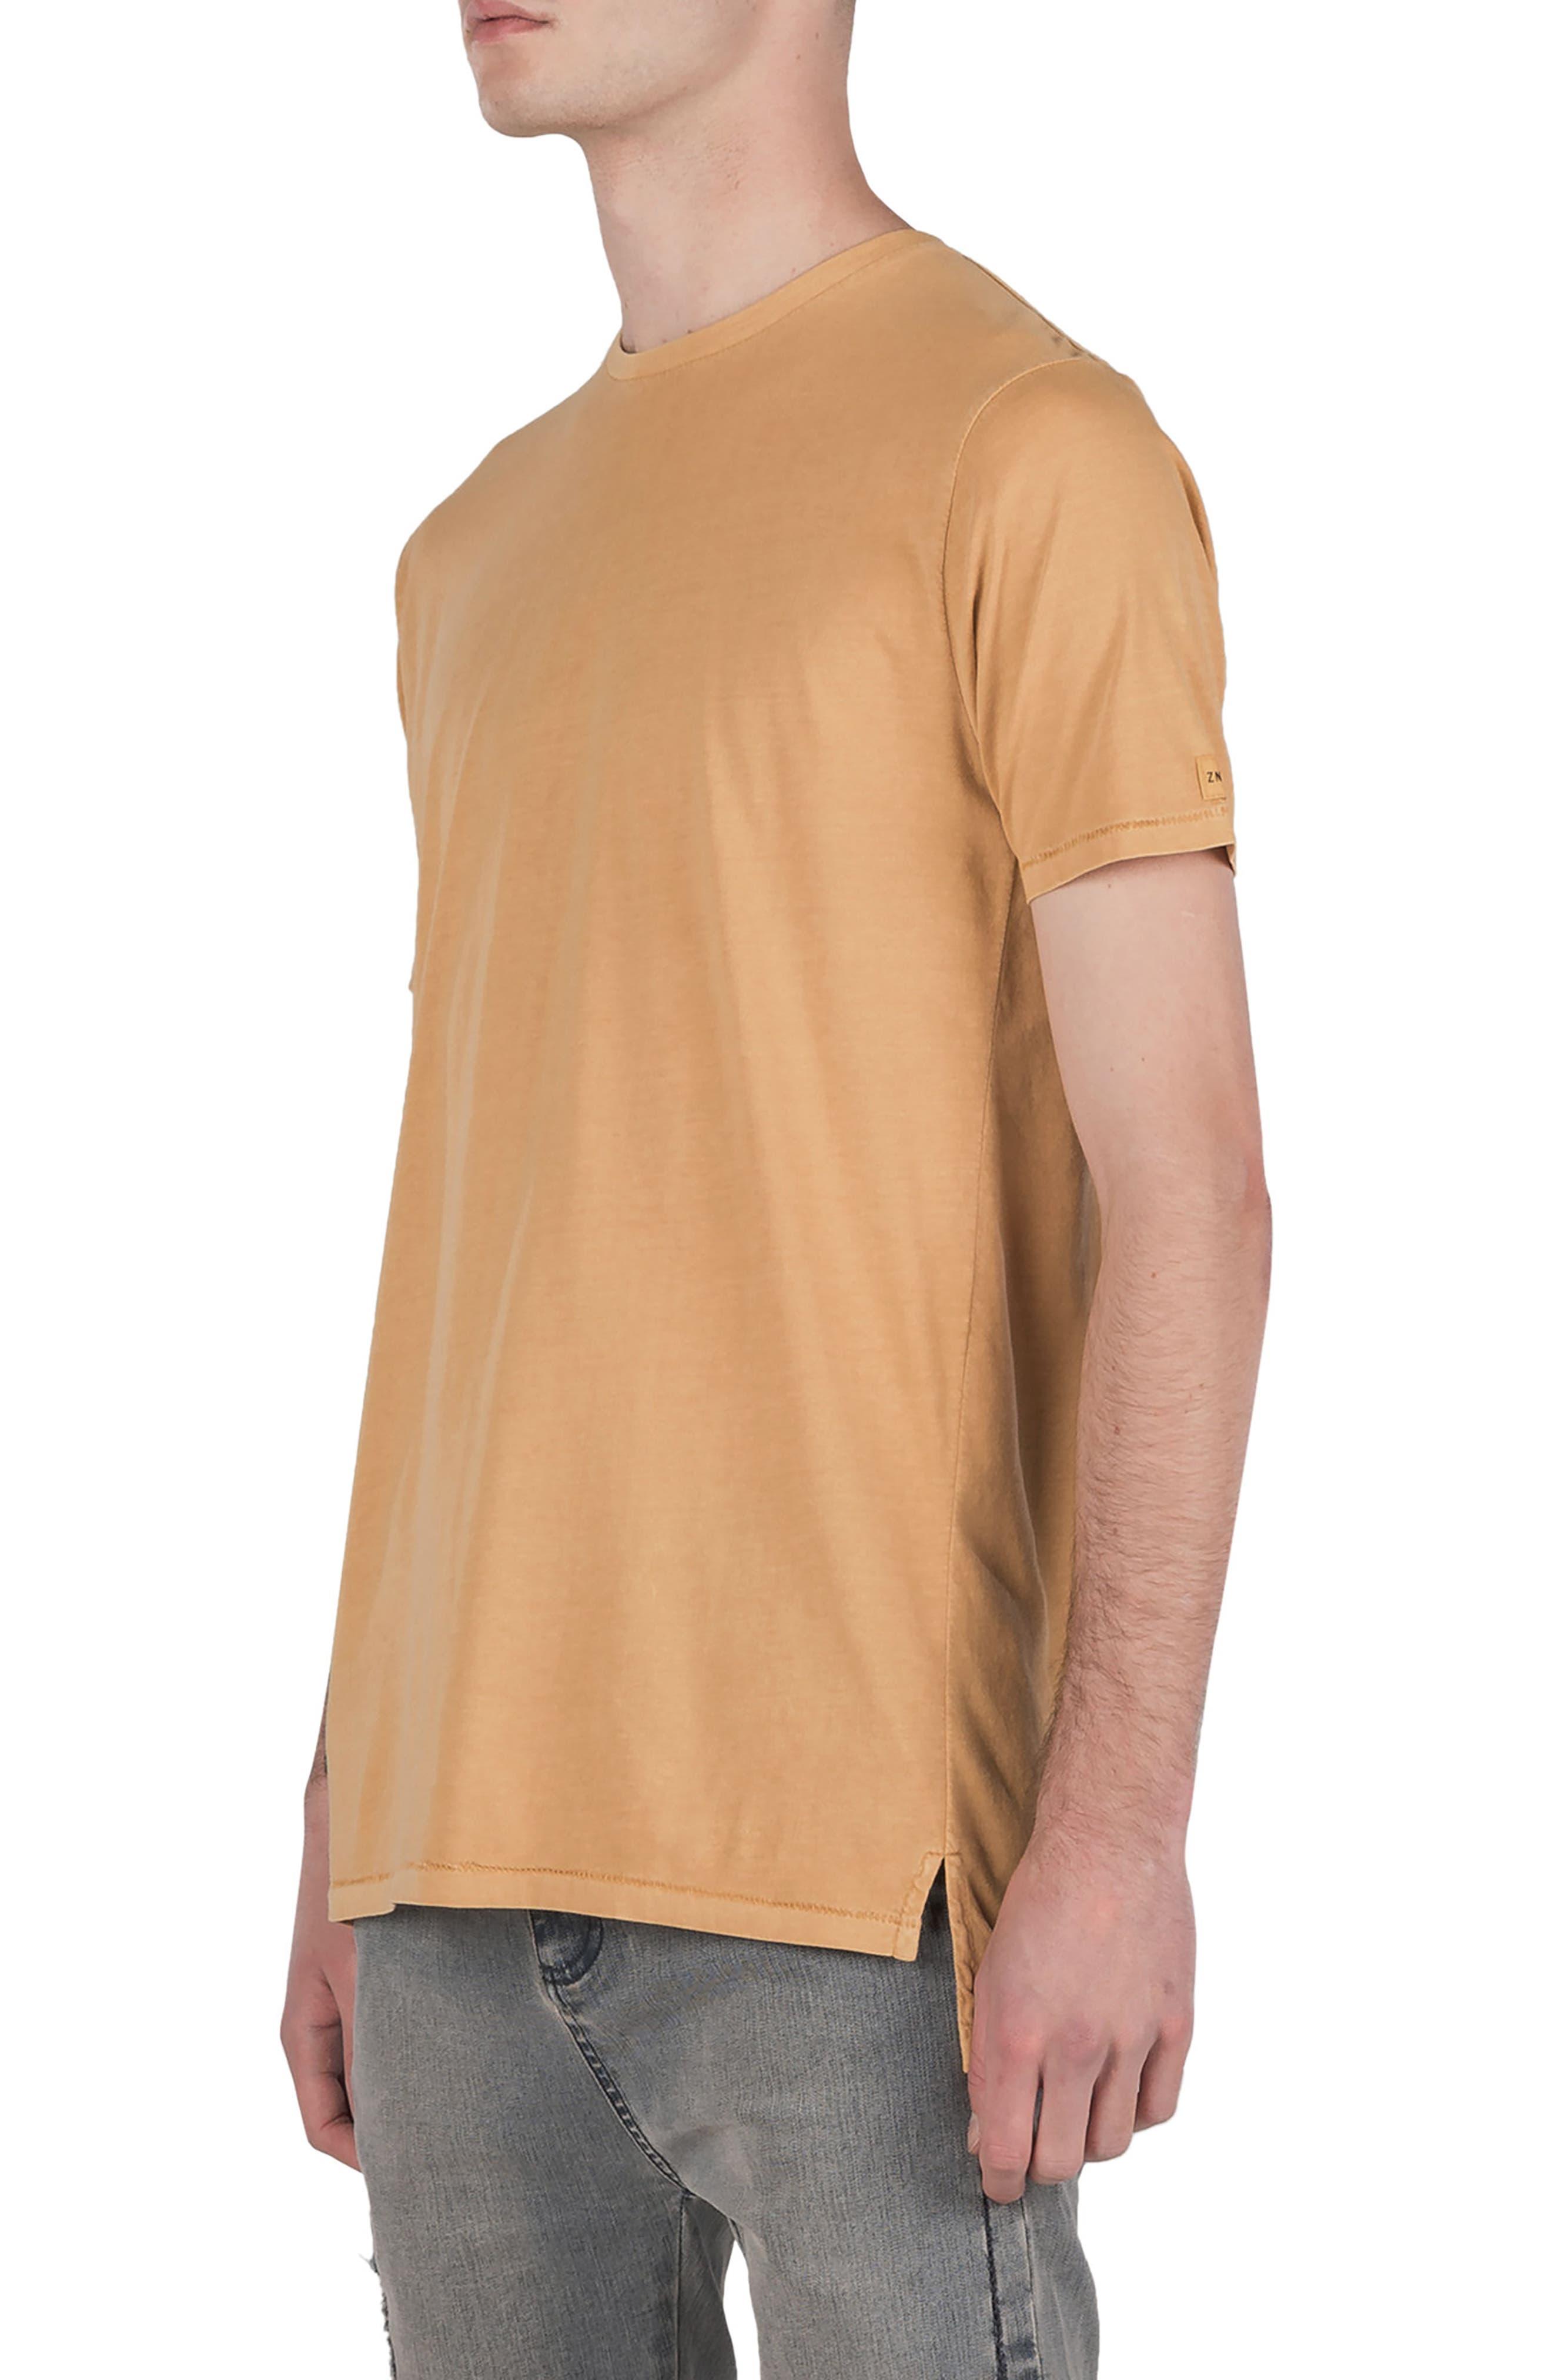 Flintlock T-Shirt,                             Alternate thumbnail 2, color,                             Saffron